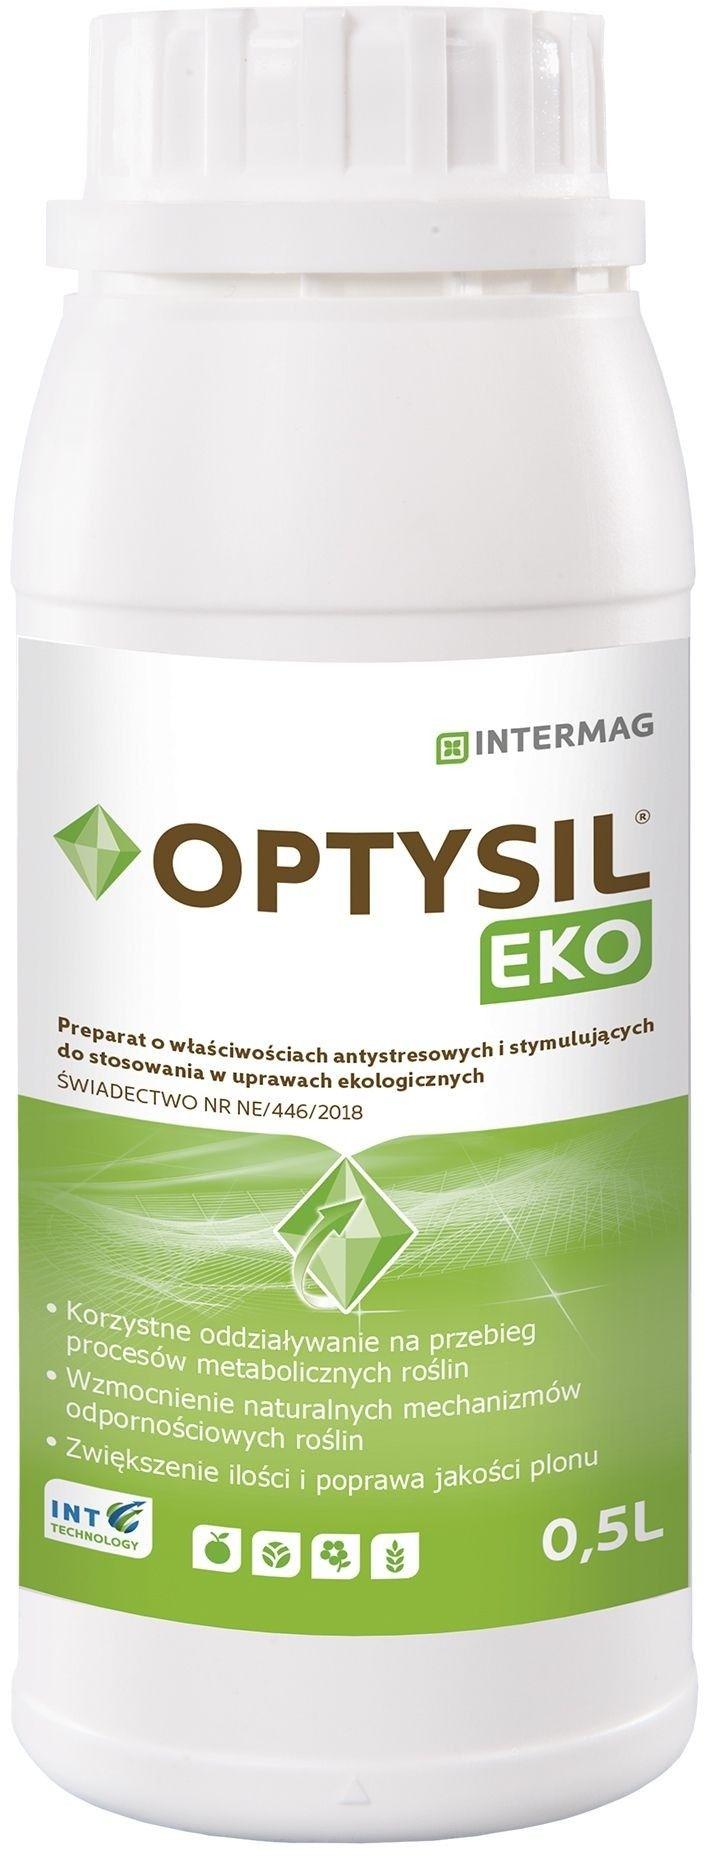 OPTYSIL EKO 0,5L